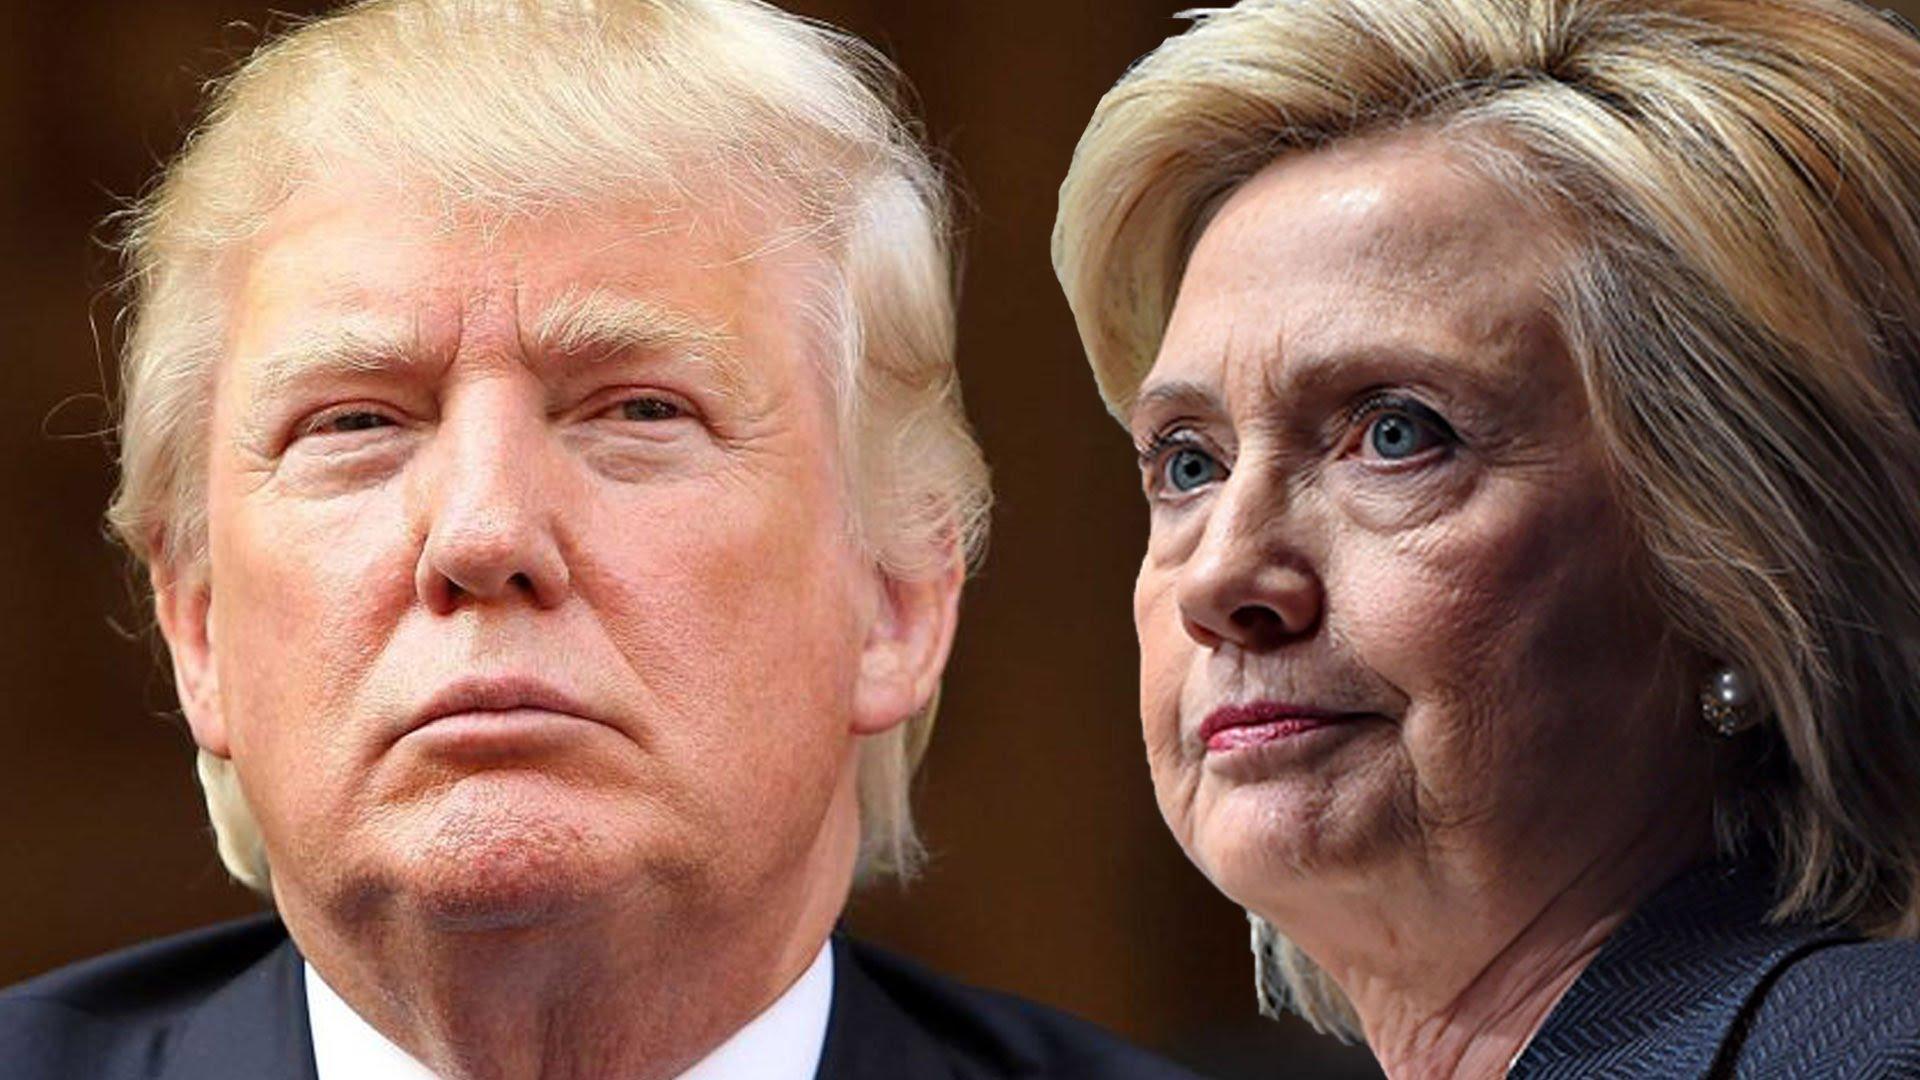 Hillary Clinton (R) with Donald Trump